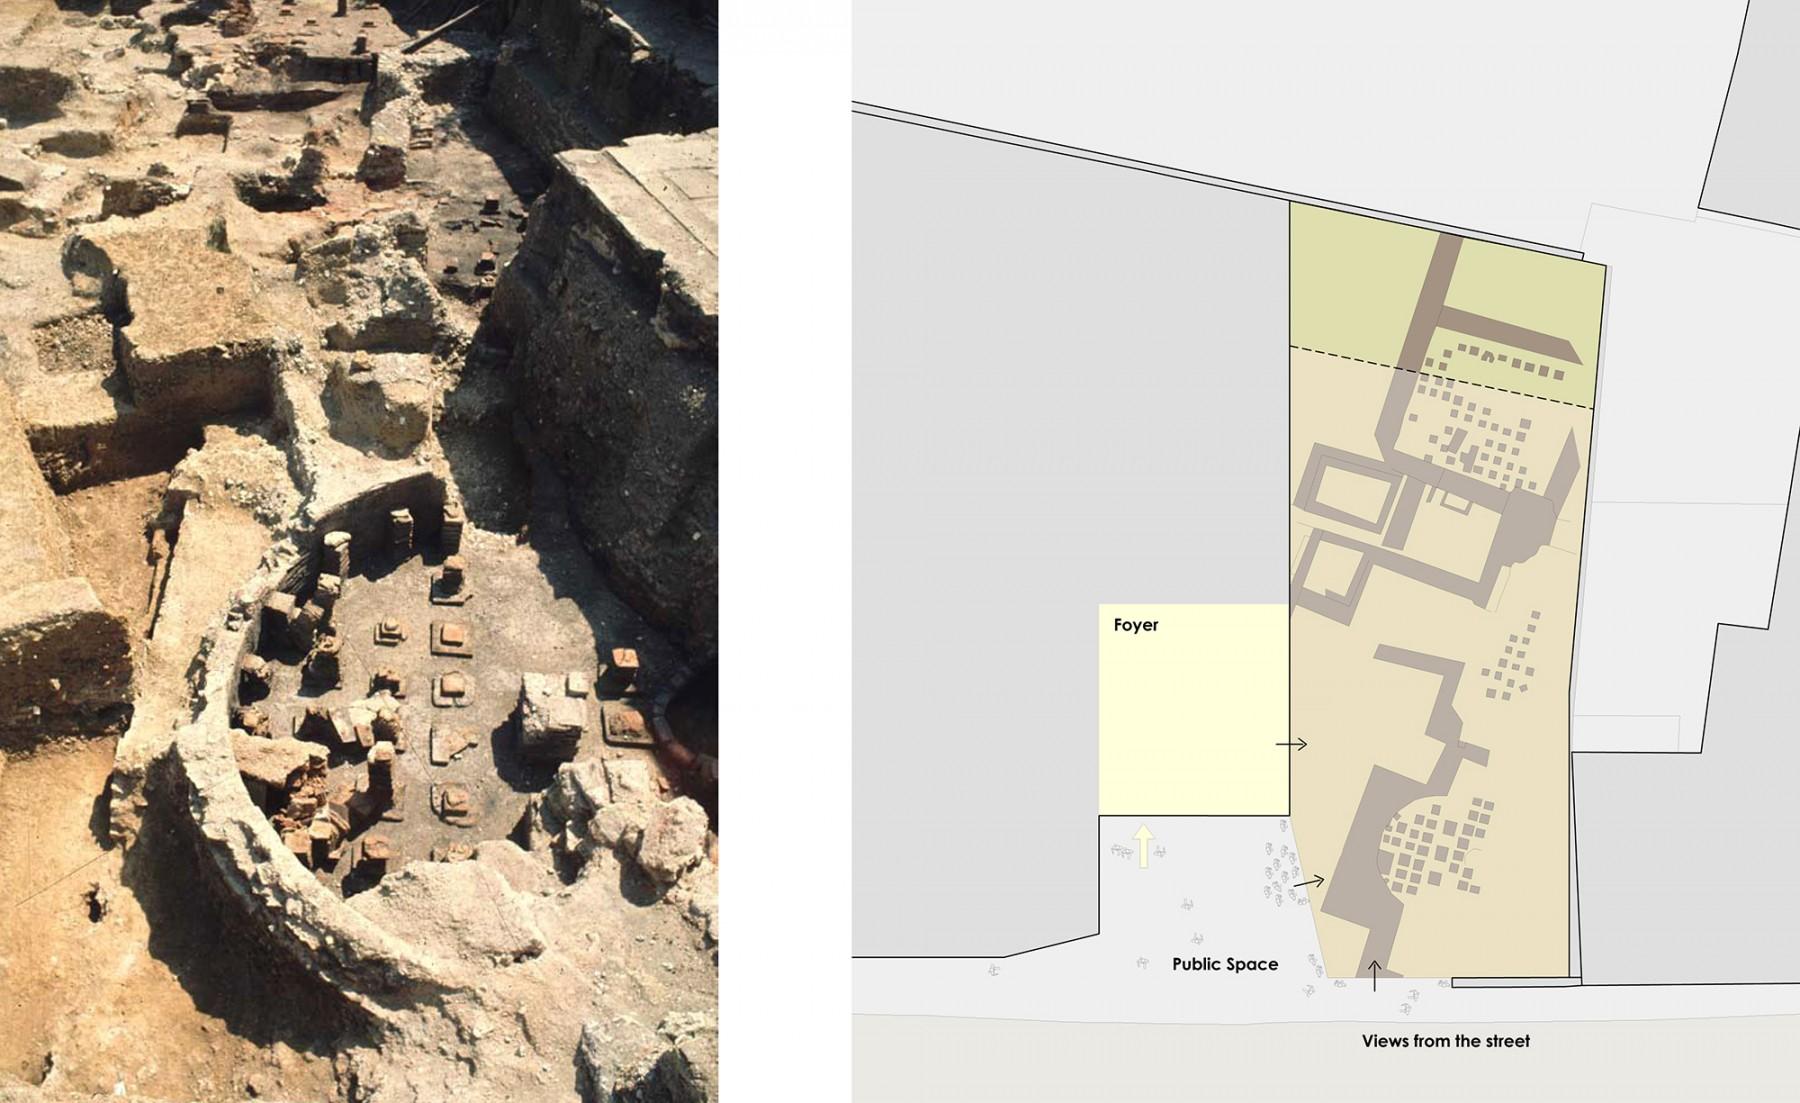 Chichester-district-museum-west-sussex-Roman-baths-competition-RIBA-Short-list-Jamie-Fobert-architects-6